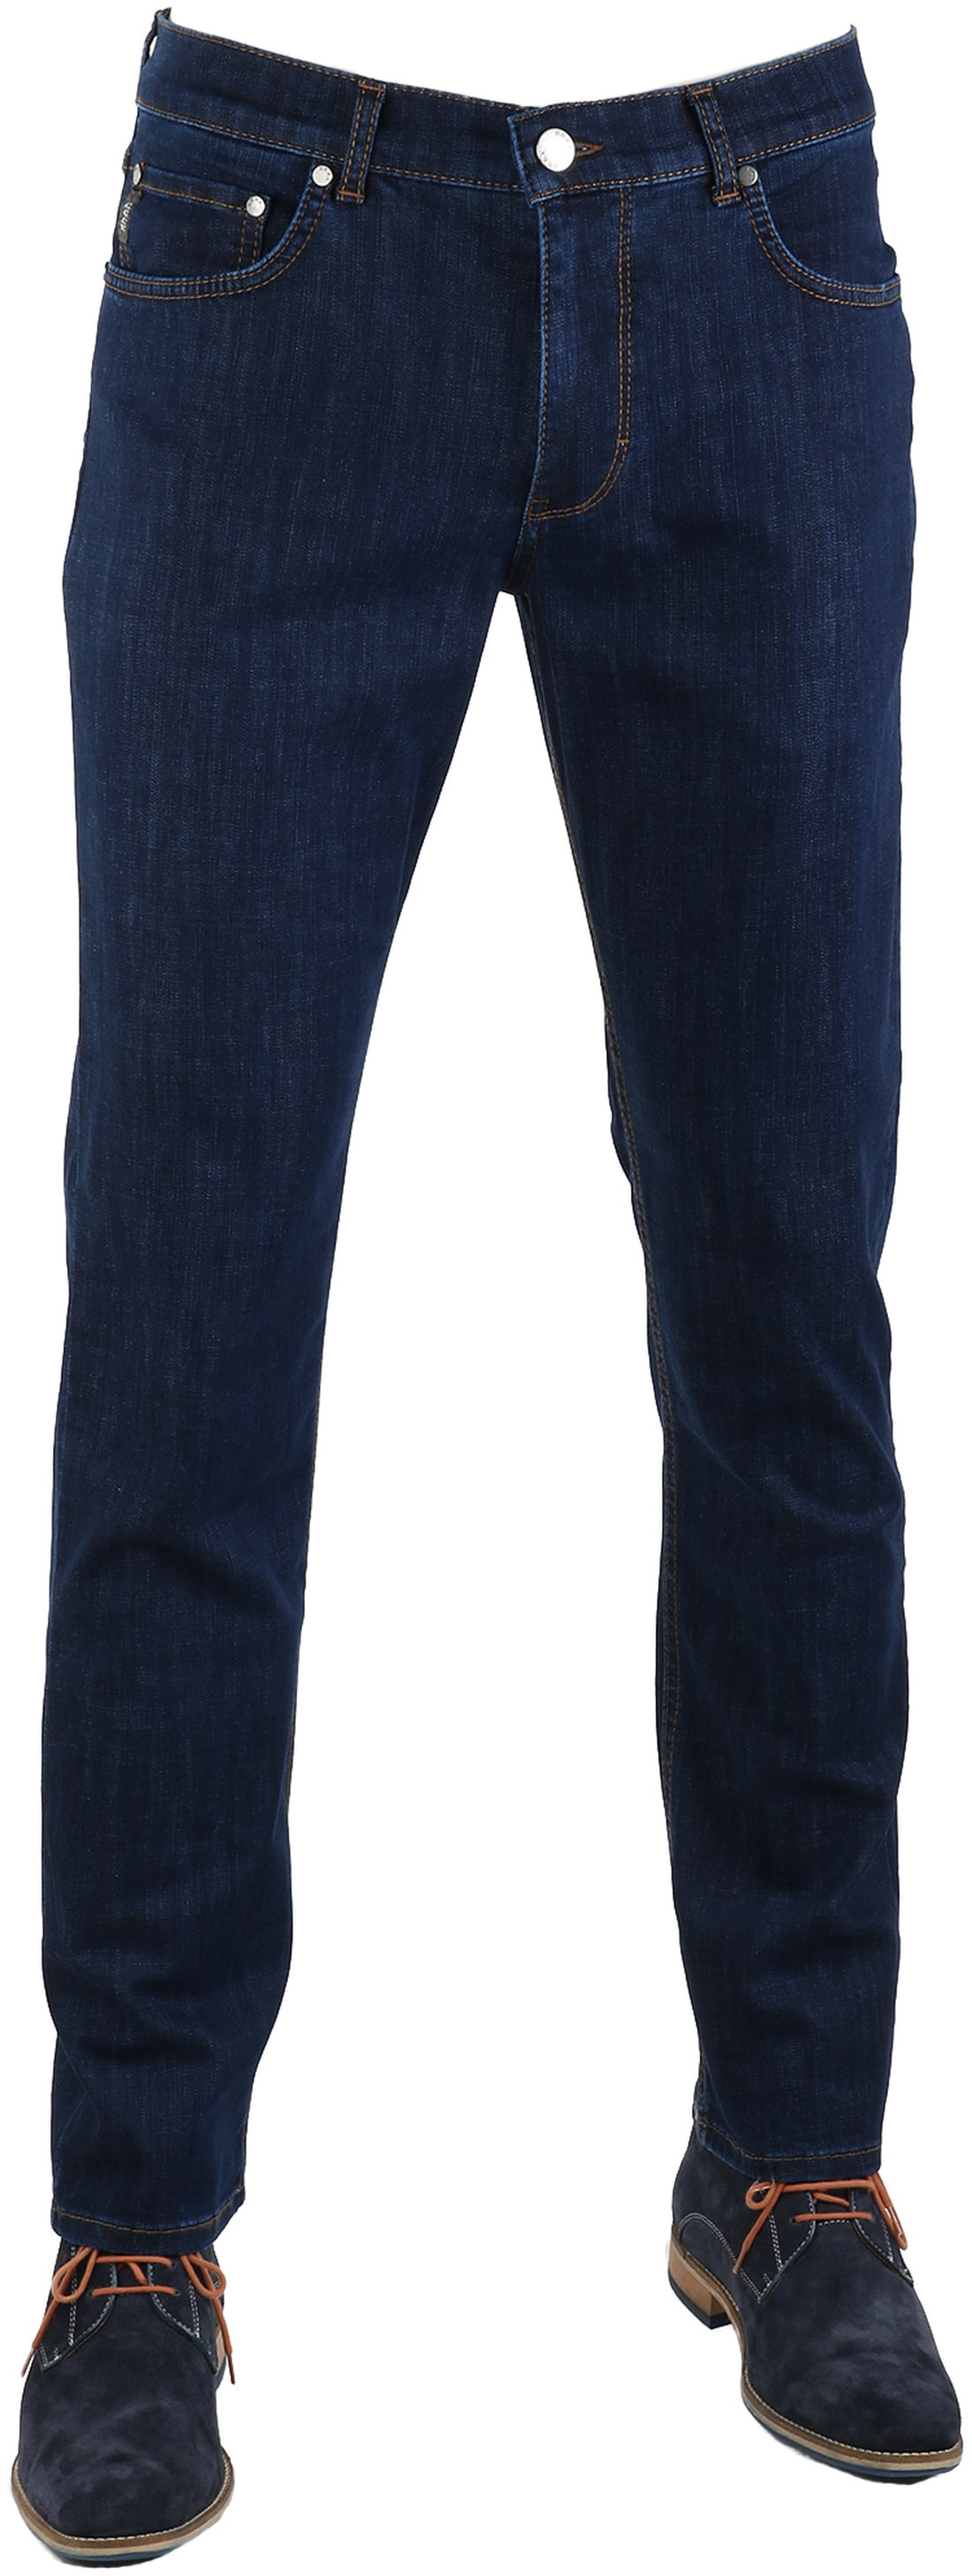 Brax Cooper Denim Jeans Five Pocket foto 0